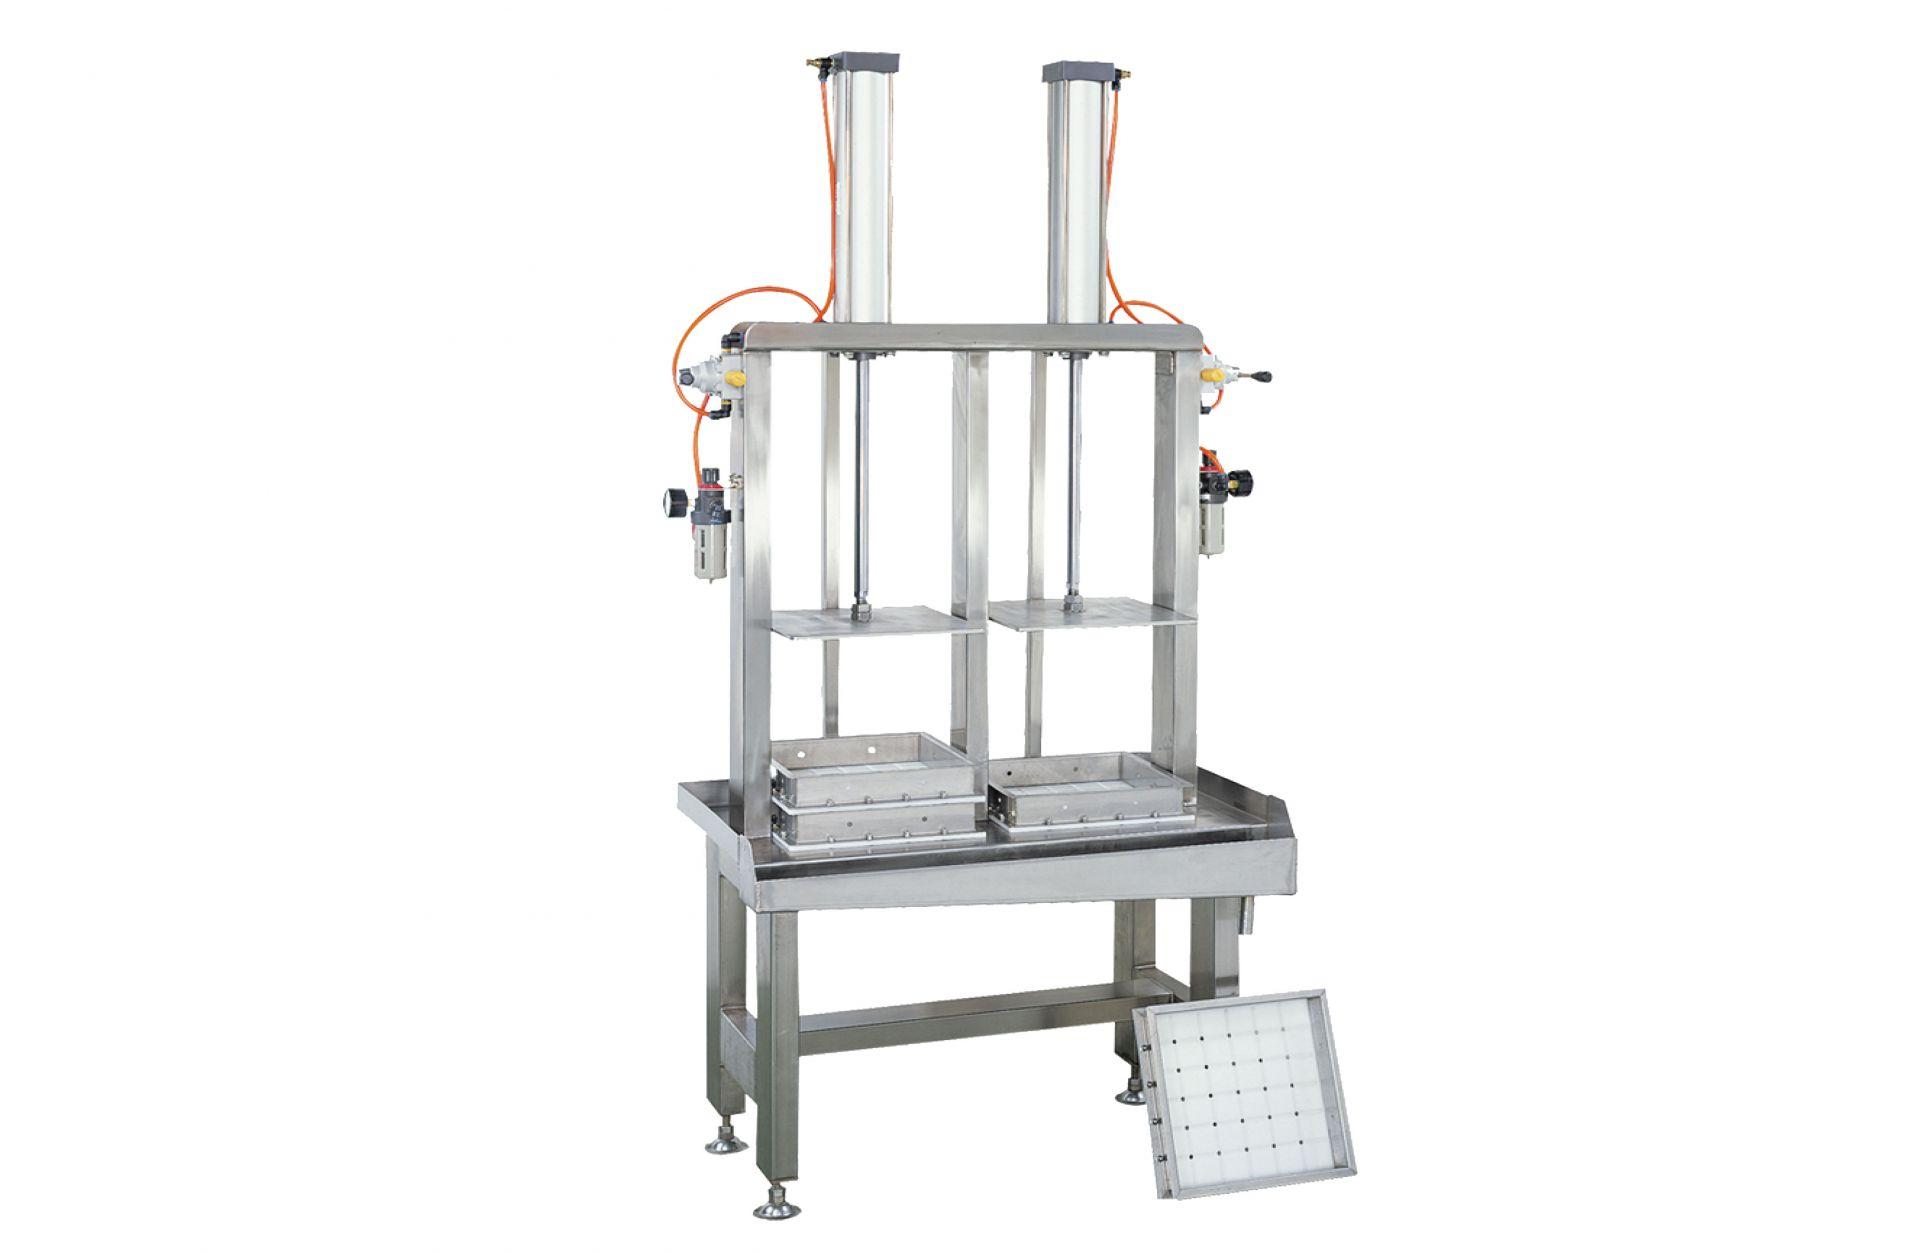 Tofu Pressing Machine - Tofu Pressing Machine